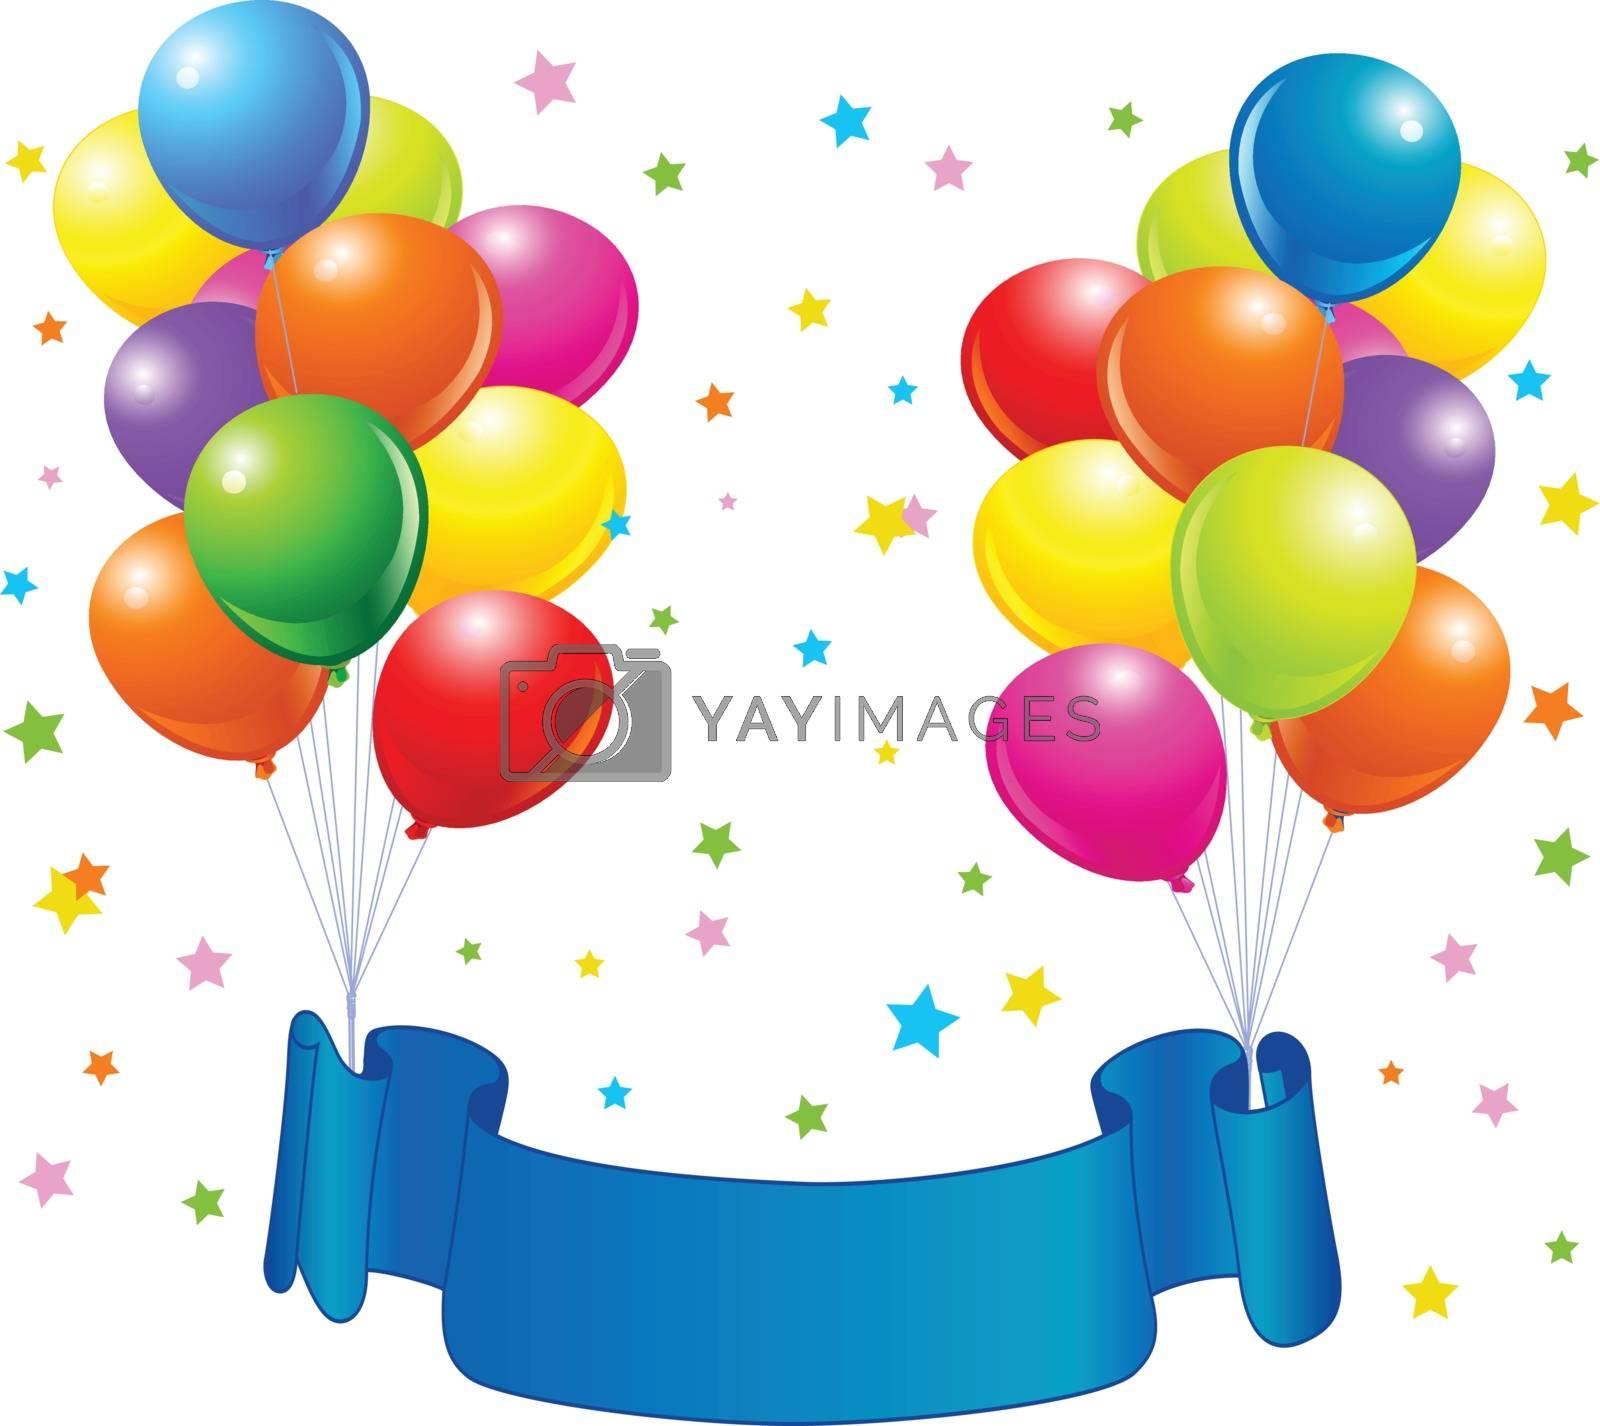 Royalty free image of Birthday balloons design by Dazdraperma